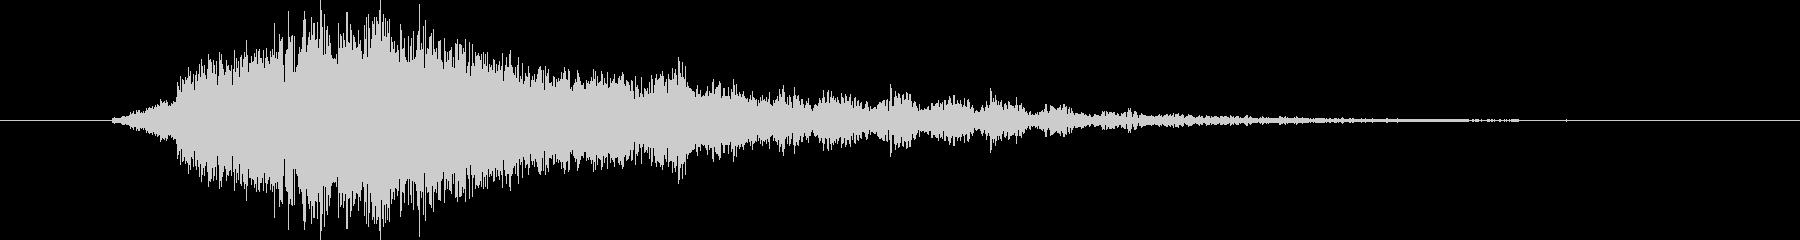 CINEMATIC BRAAMS_05の未再生の波形